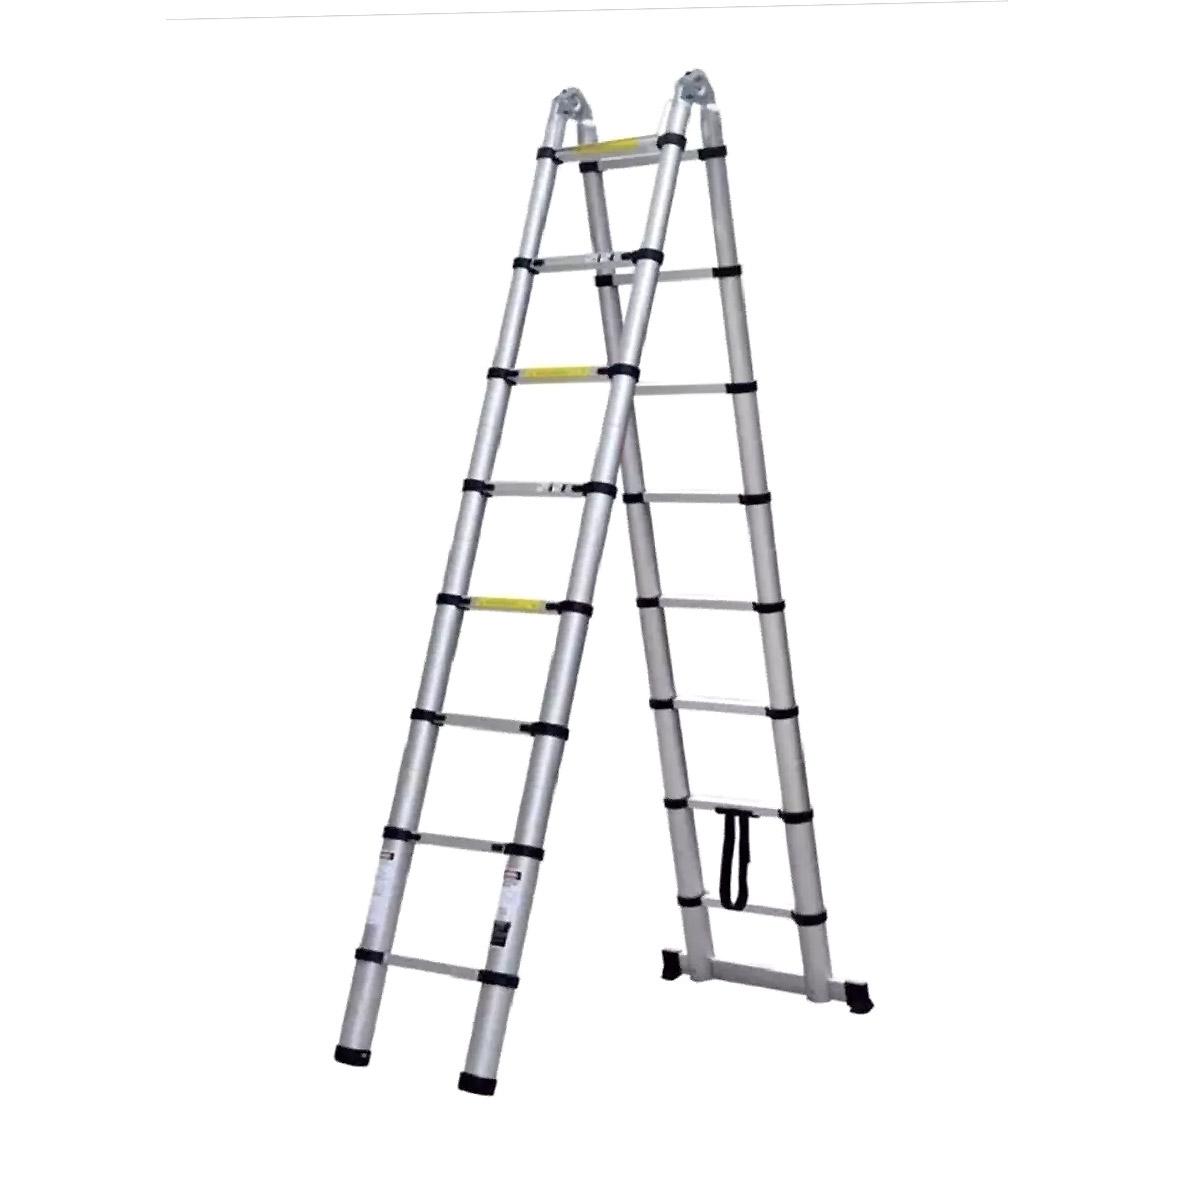 Escada alumínio Telescópica dupla 16 degraus 2,4/5m Starfer